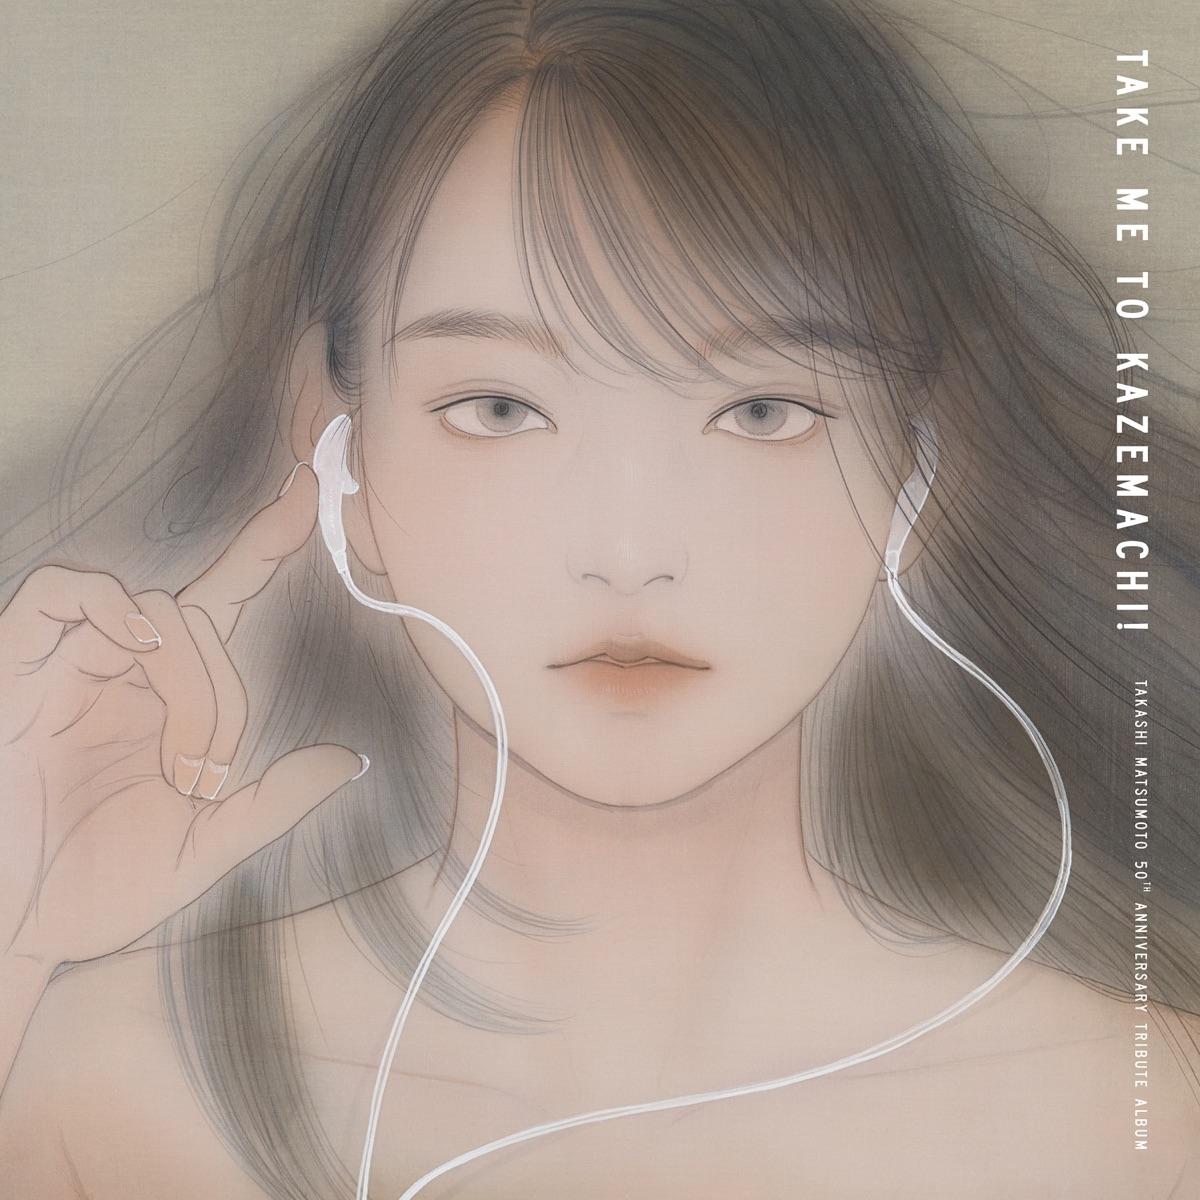 Cover for『DAOKO - Nausicaa of the Valley of the Wind』from the release『Matsumoto Takashi Sakushi Katsudou 50 Shuunen Tribute Album